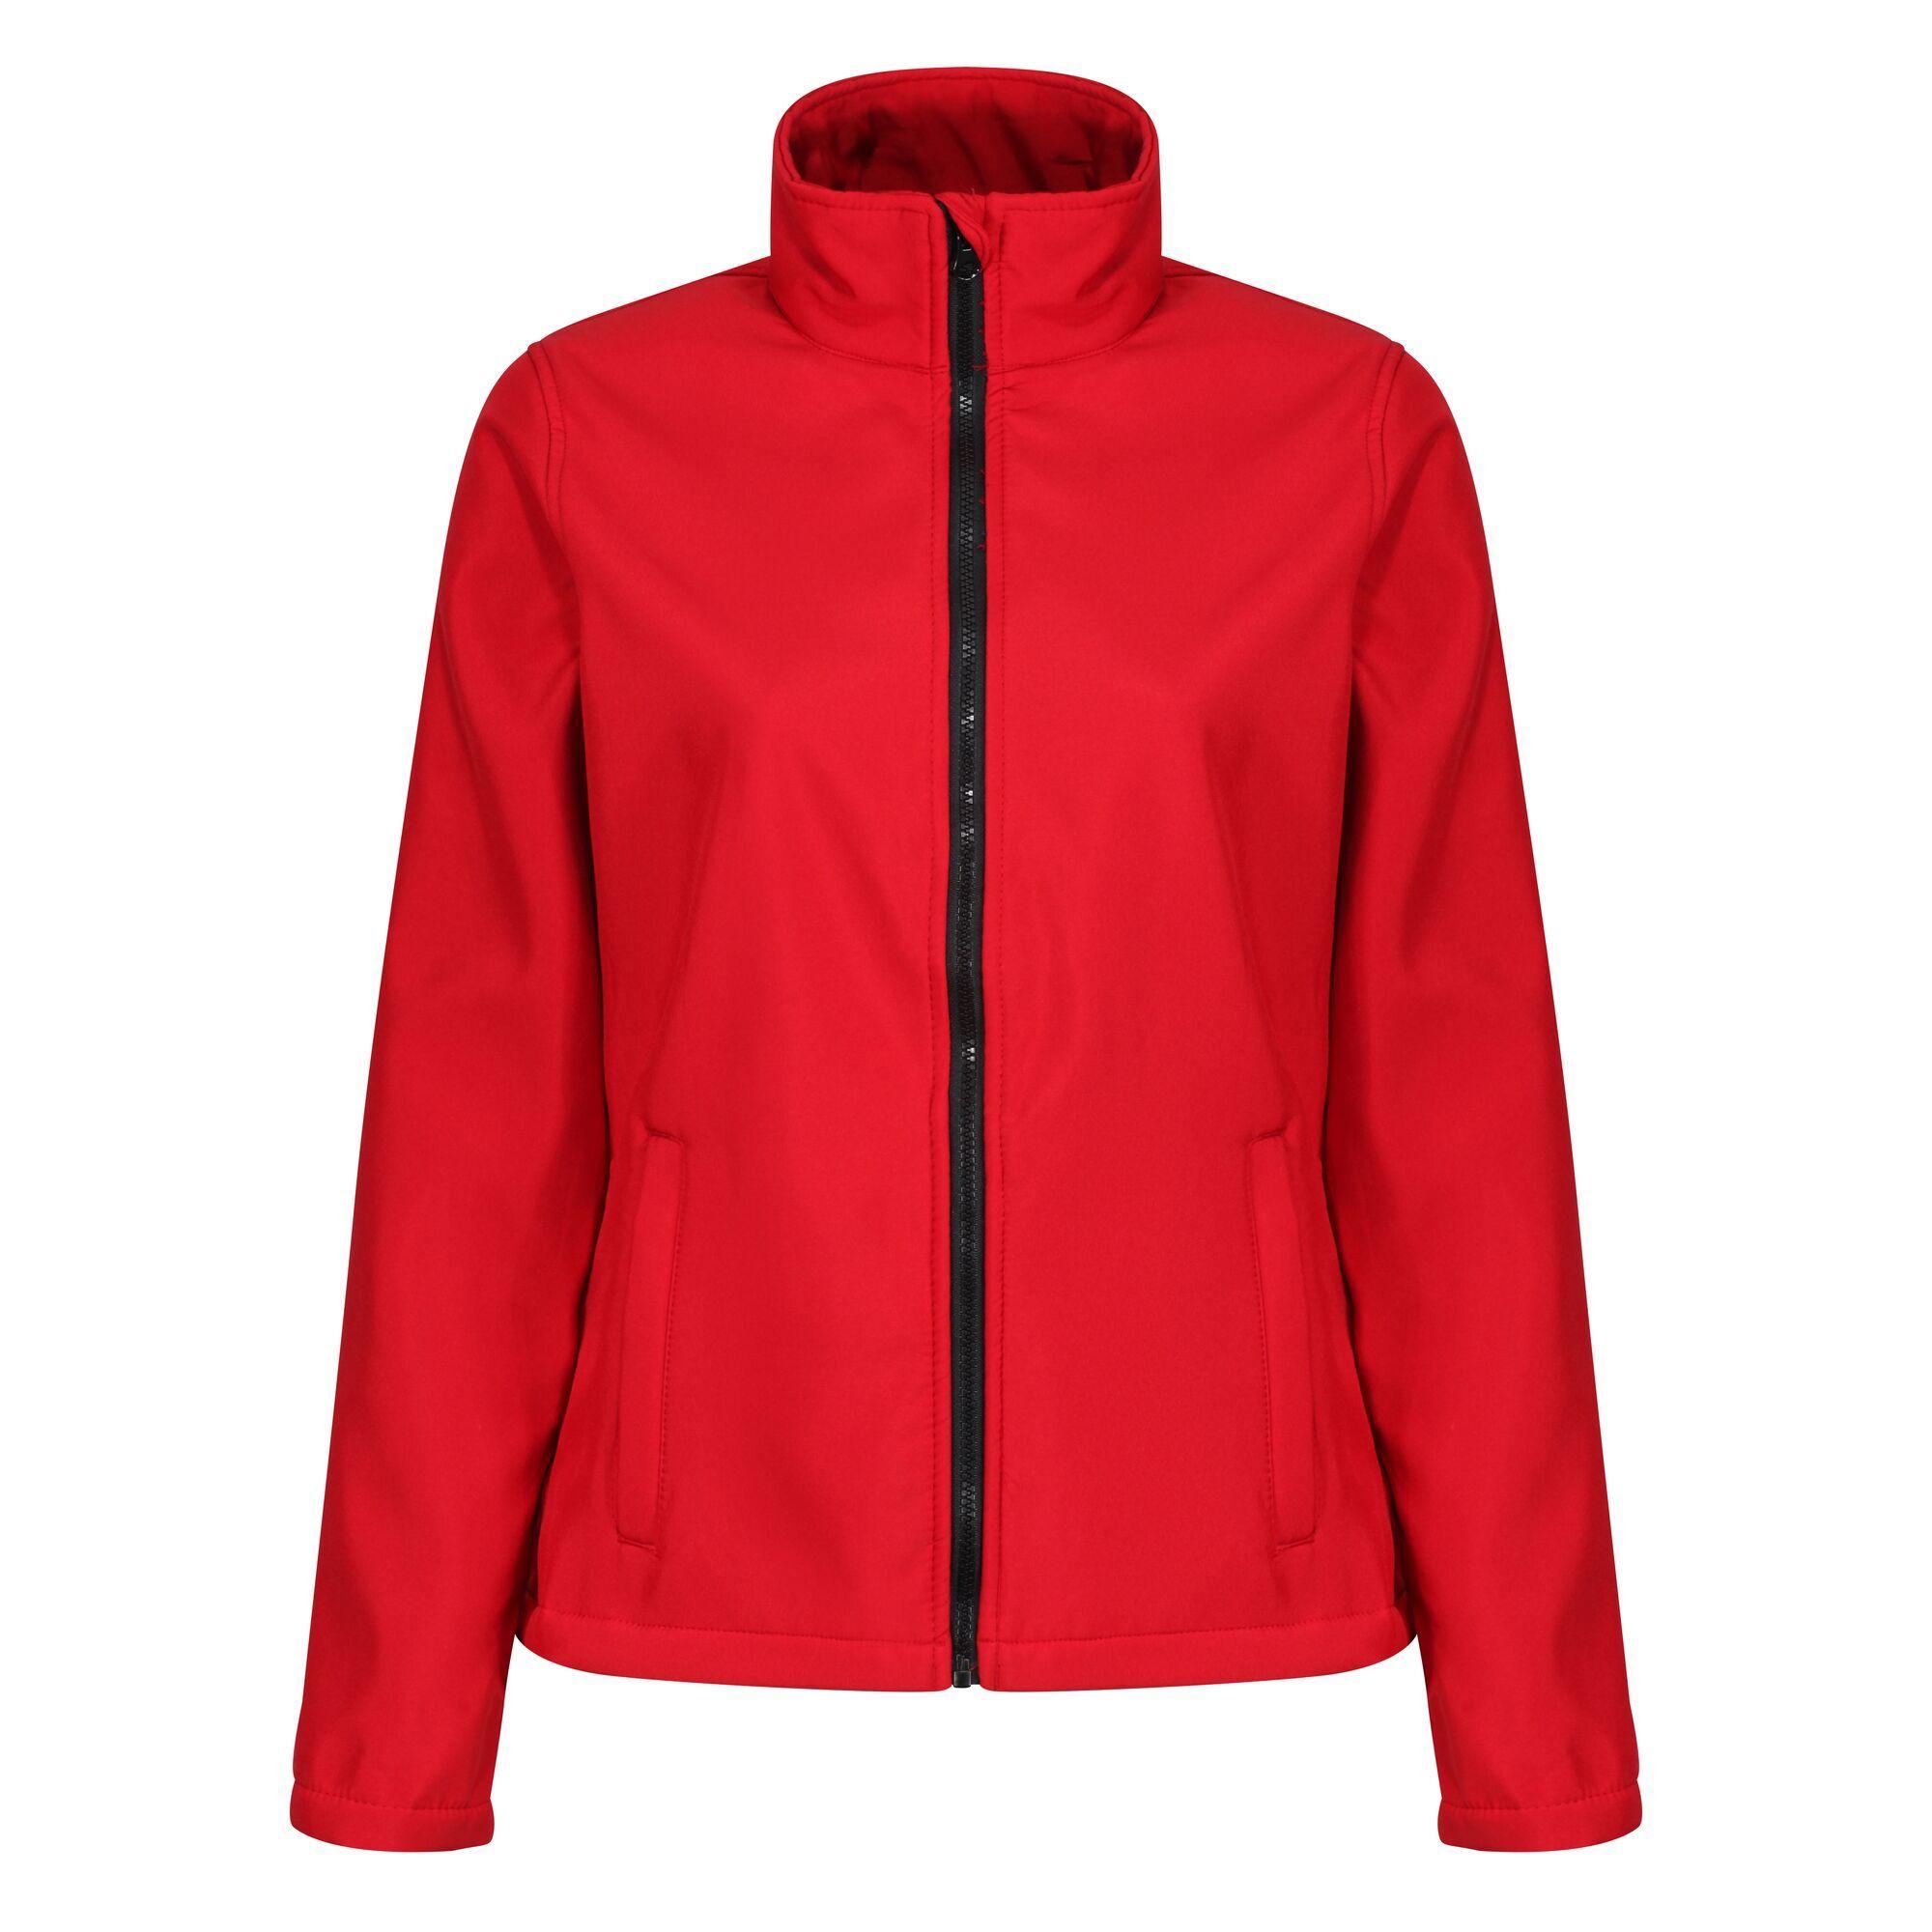 Regatta Standout Womens/Ladies Ablaze Printable Soft Shell Jacket (16) (White/Light Steel)